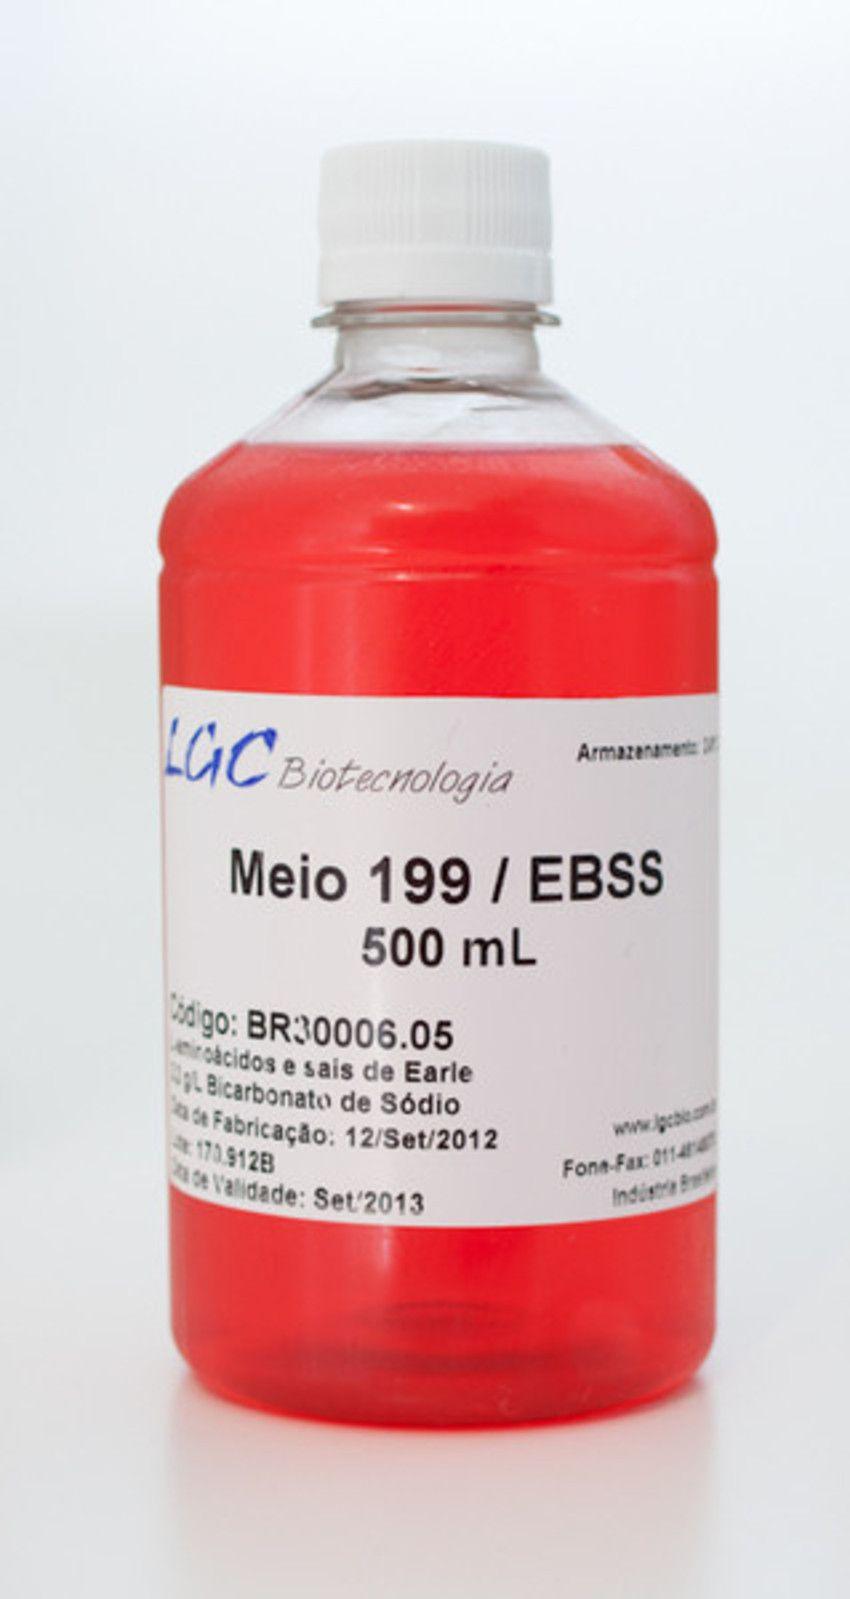 MEIO 199/EBSS, COM L-GLUTAMINA